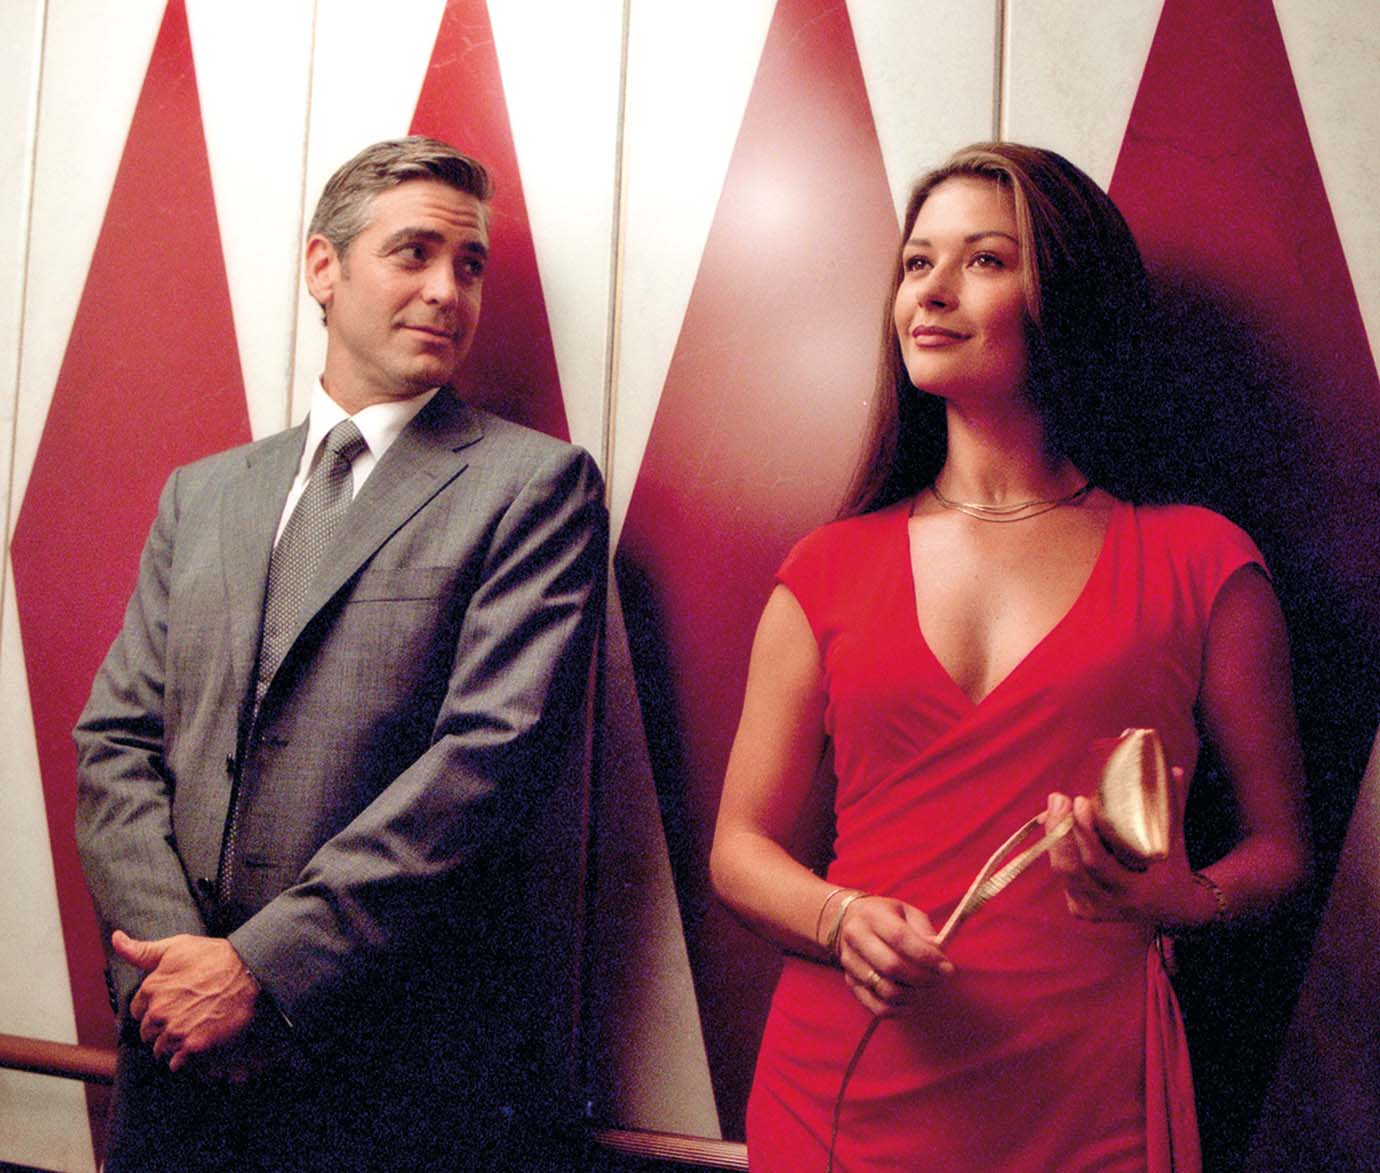 INTOLERABLE CRUELTY, George Clooney, Catherine Zeta-Jones, 2003, (c) Universal/courtesy Everett Collection